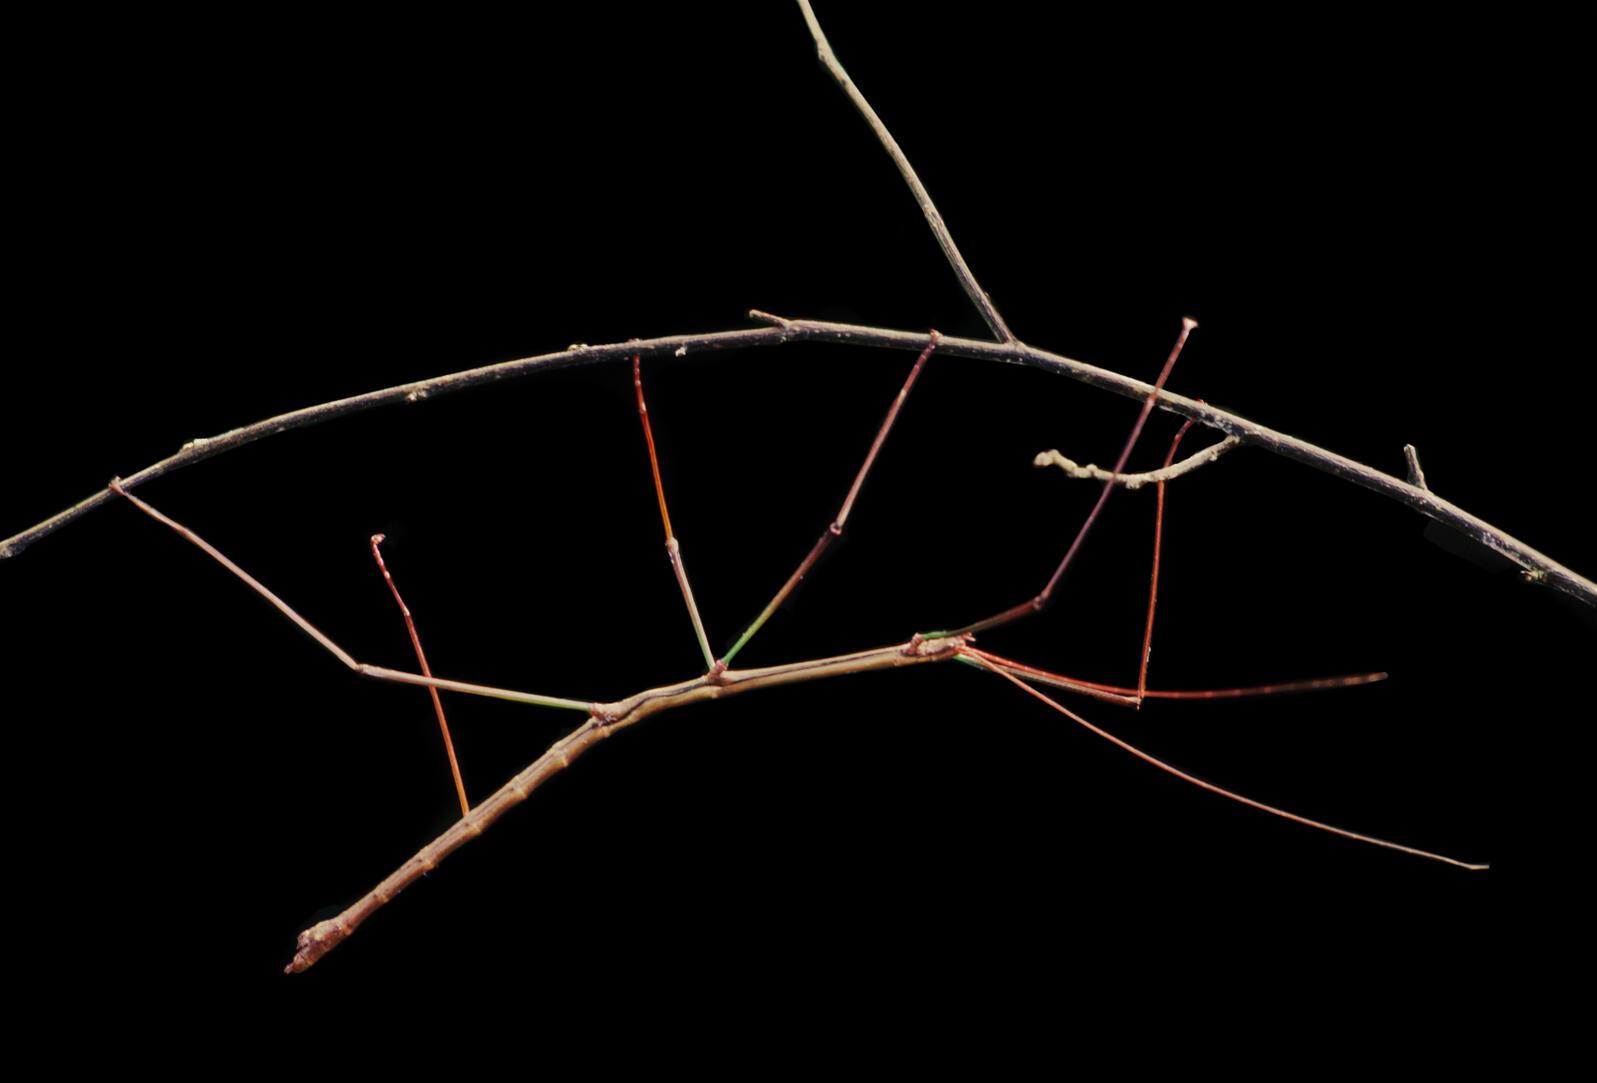 A walkingstick Photograph by Frans Lanting/Corbis